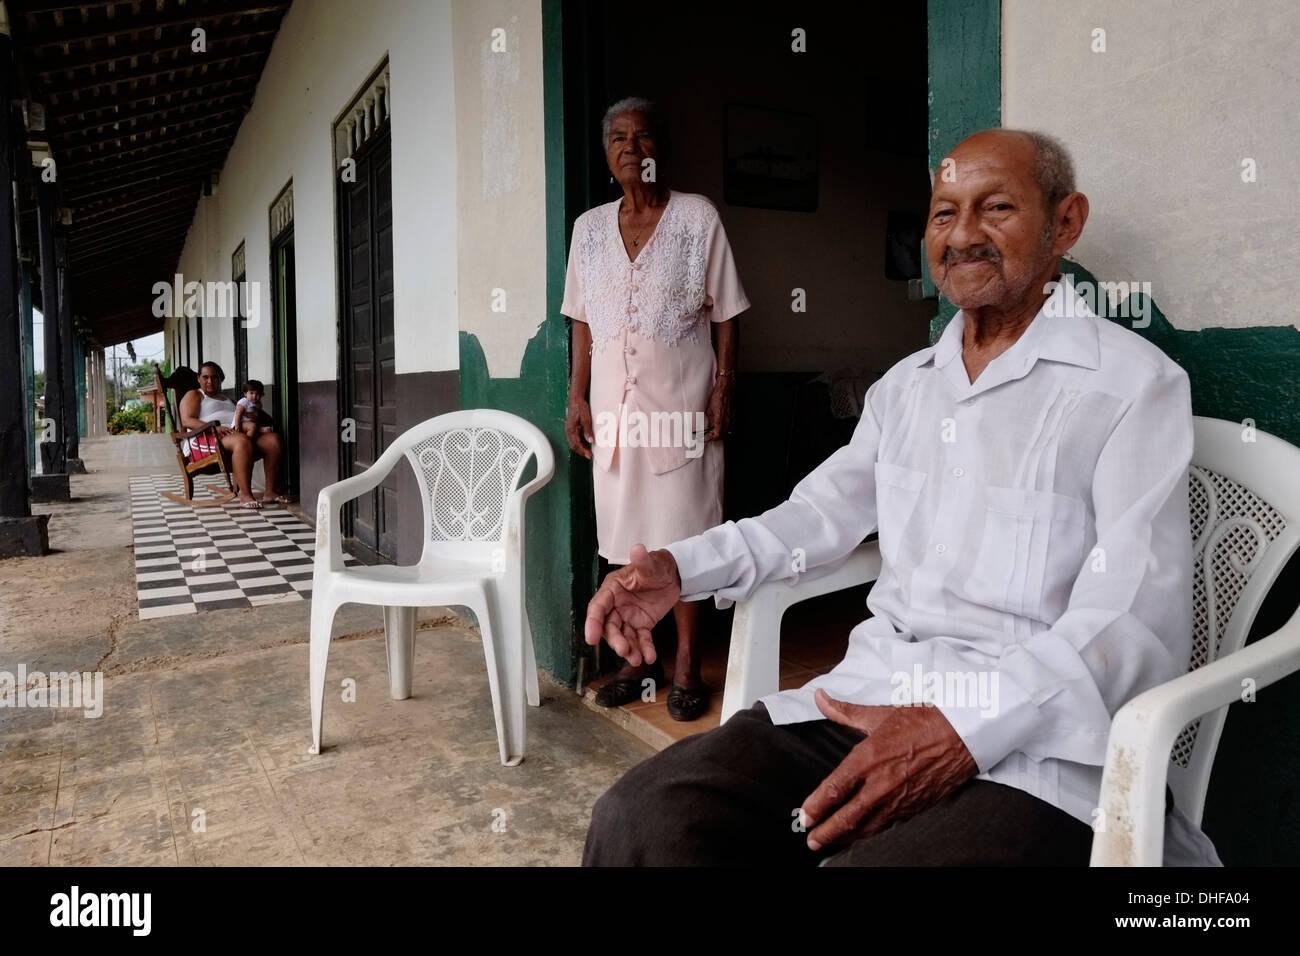 Local residents in the town of Perita Peninsula de Azuero Herrera province Republic of Panama - Stock Image